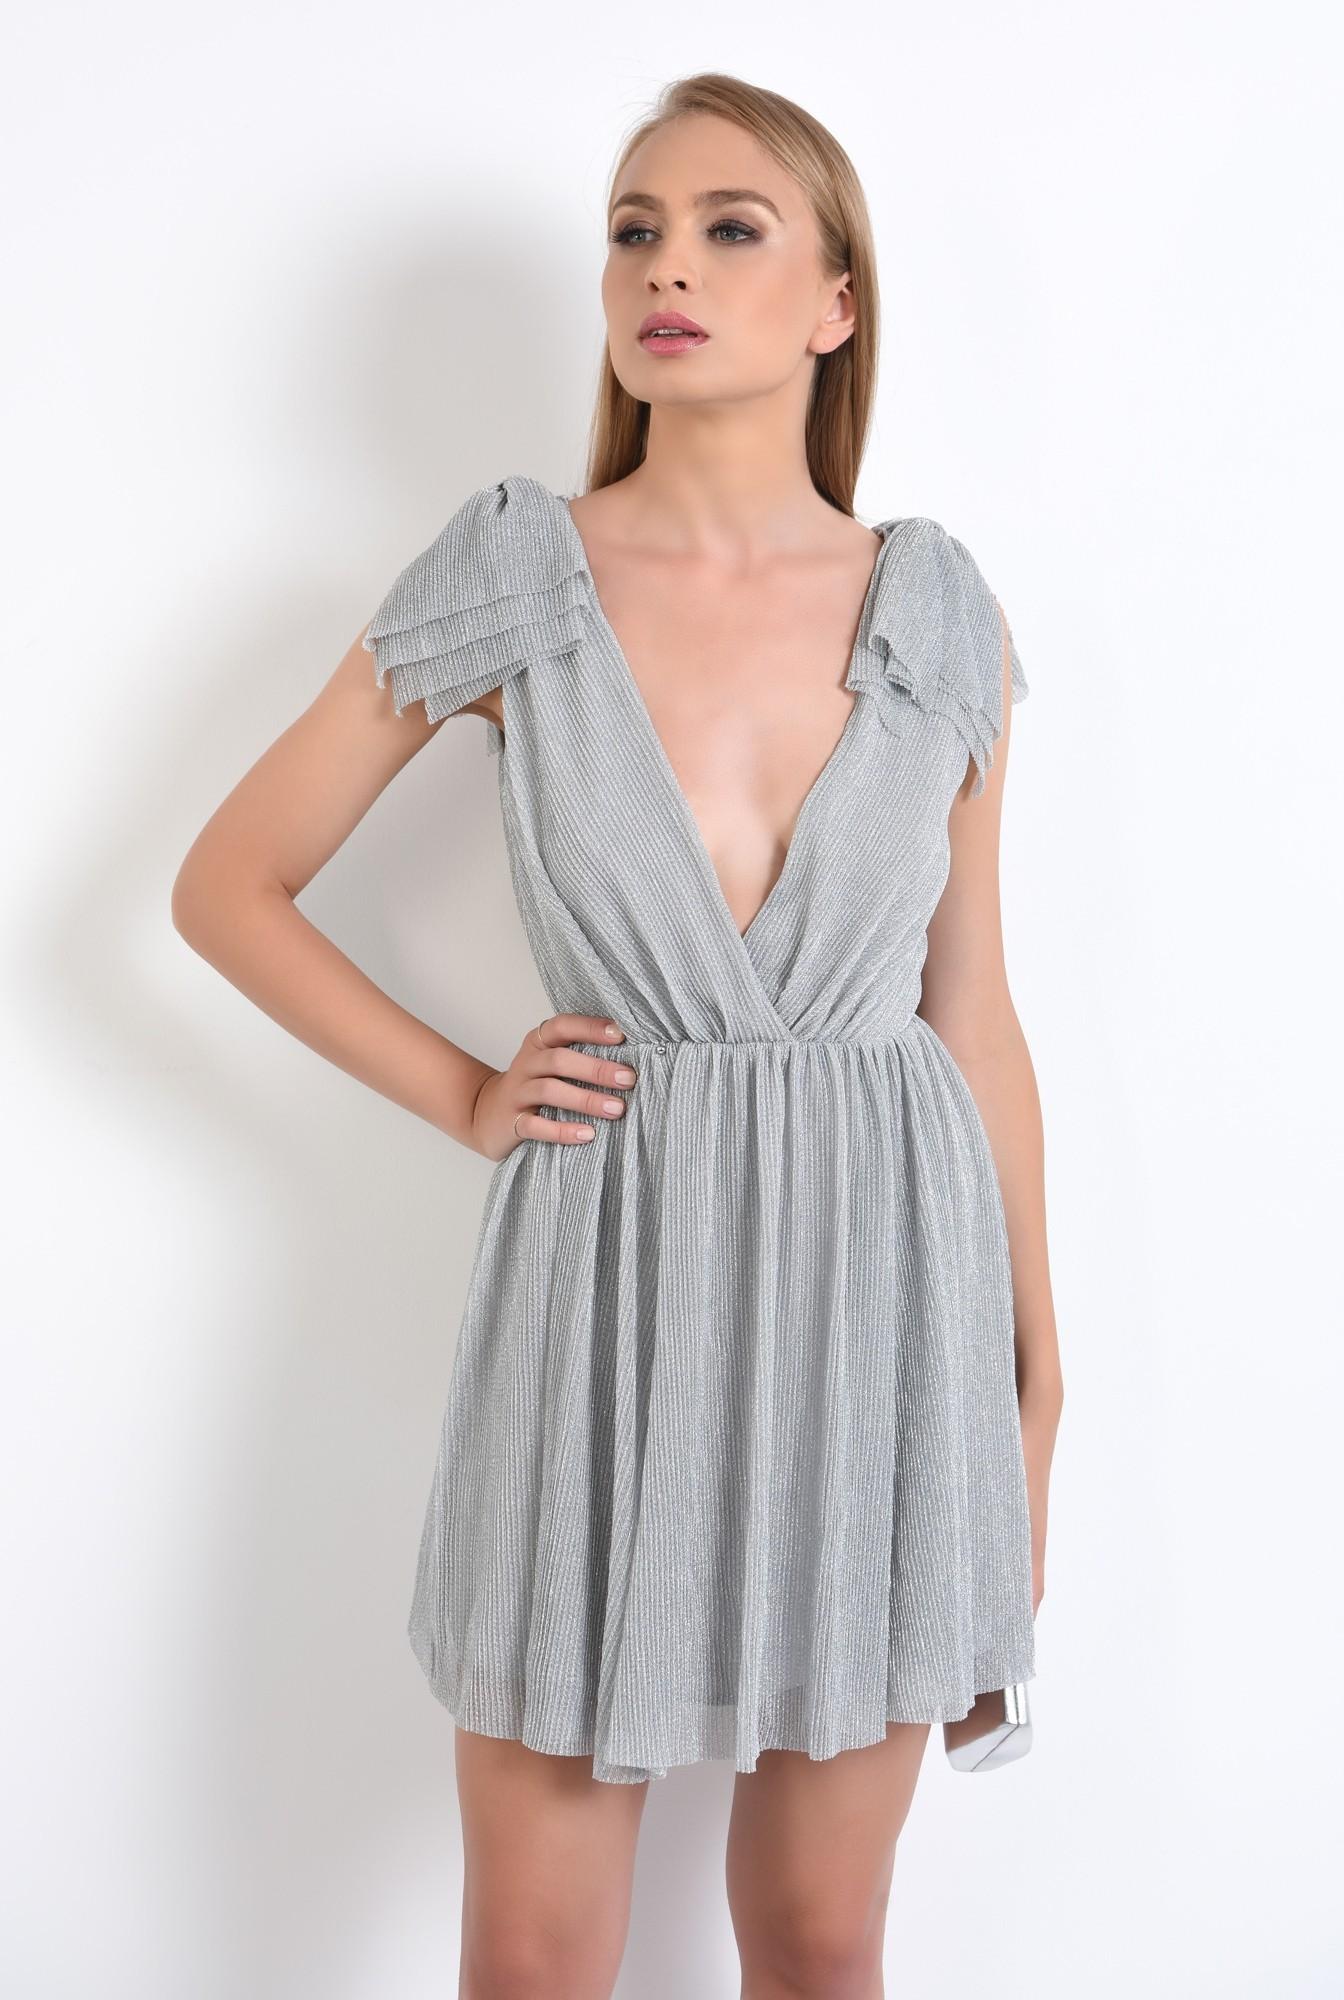 2 - rochie de ocazie, lurex, argintiu, funde la umeri, lungime mini